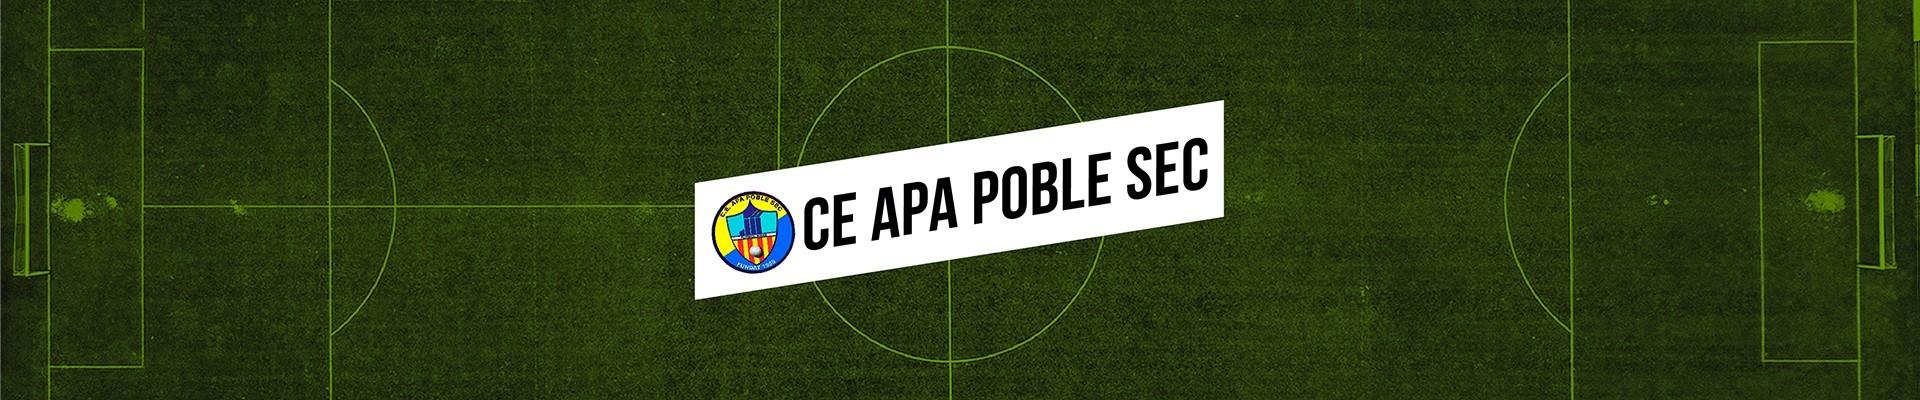 APA POBLE SEC